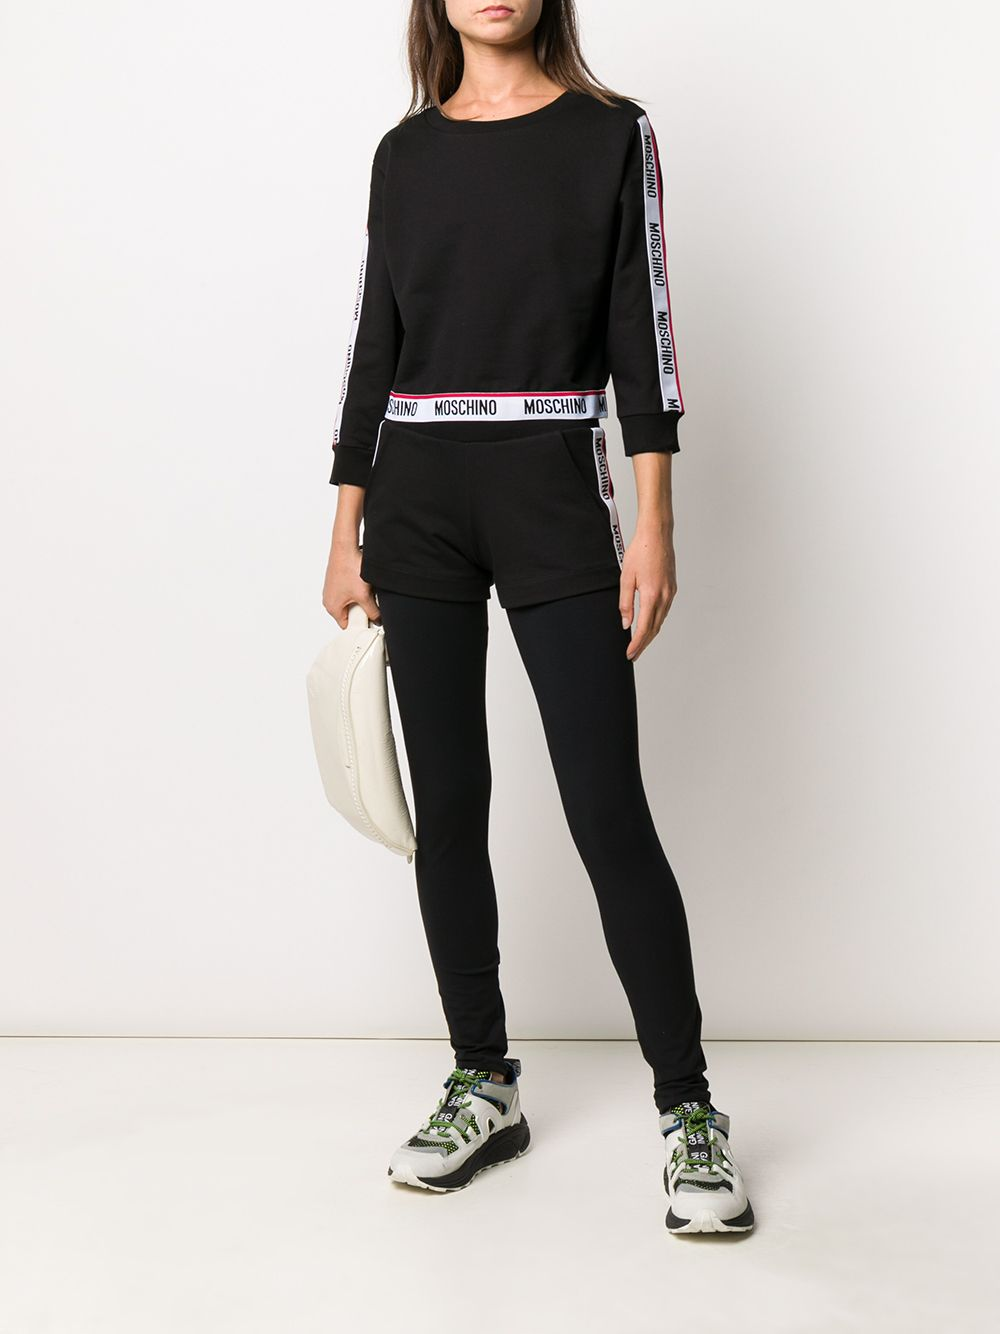 MOSCHINO | Moschino легинсы с логотипом на поясе | Clouty